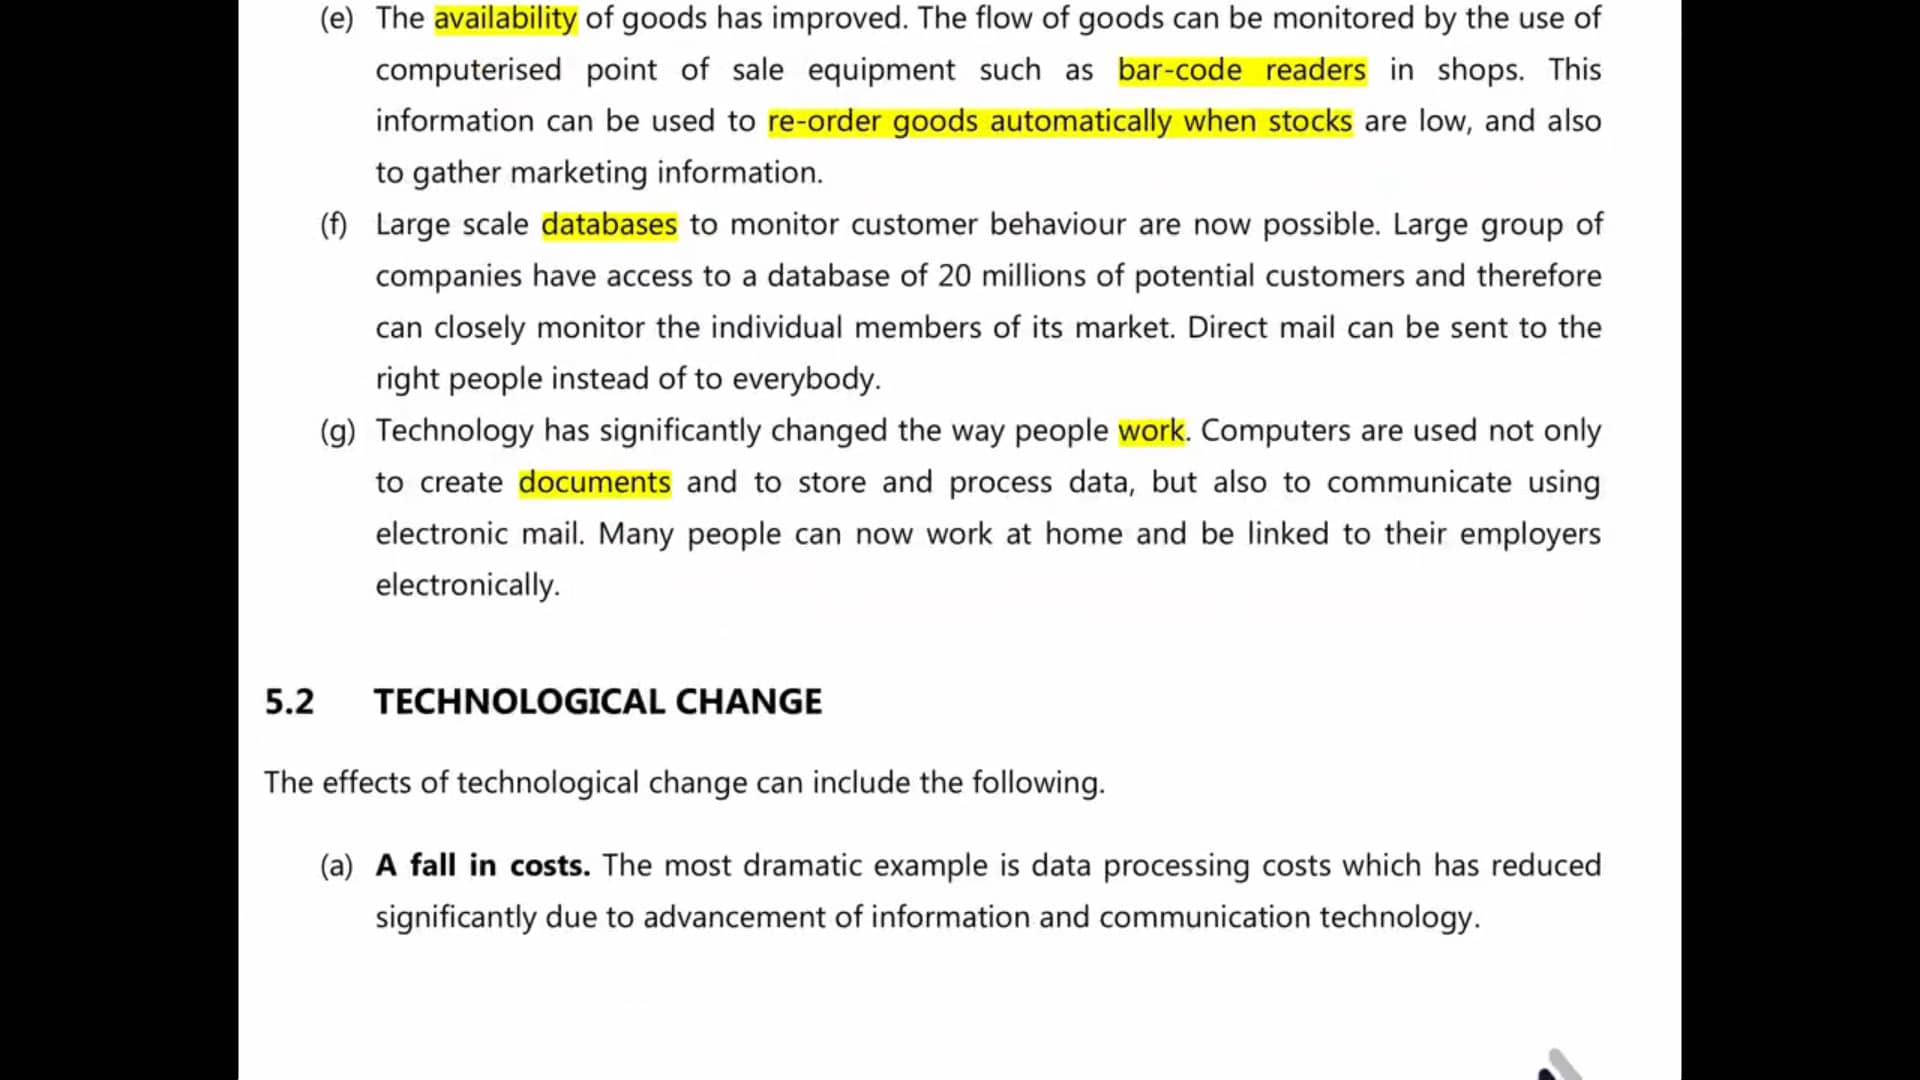 Ch 4 -Technological factor